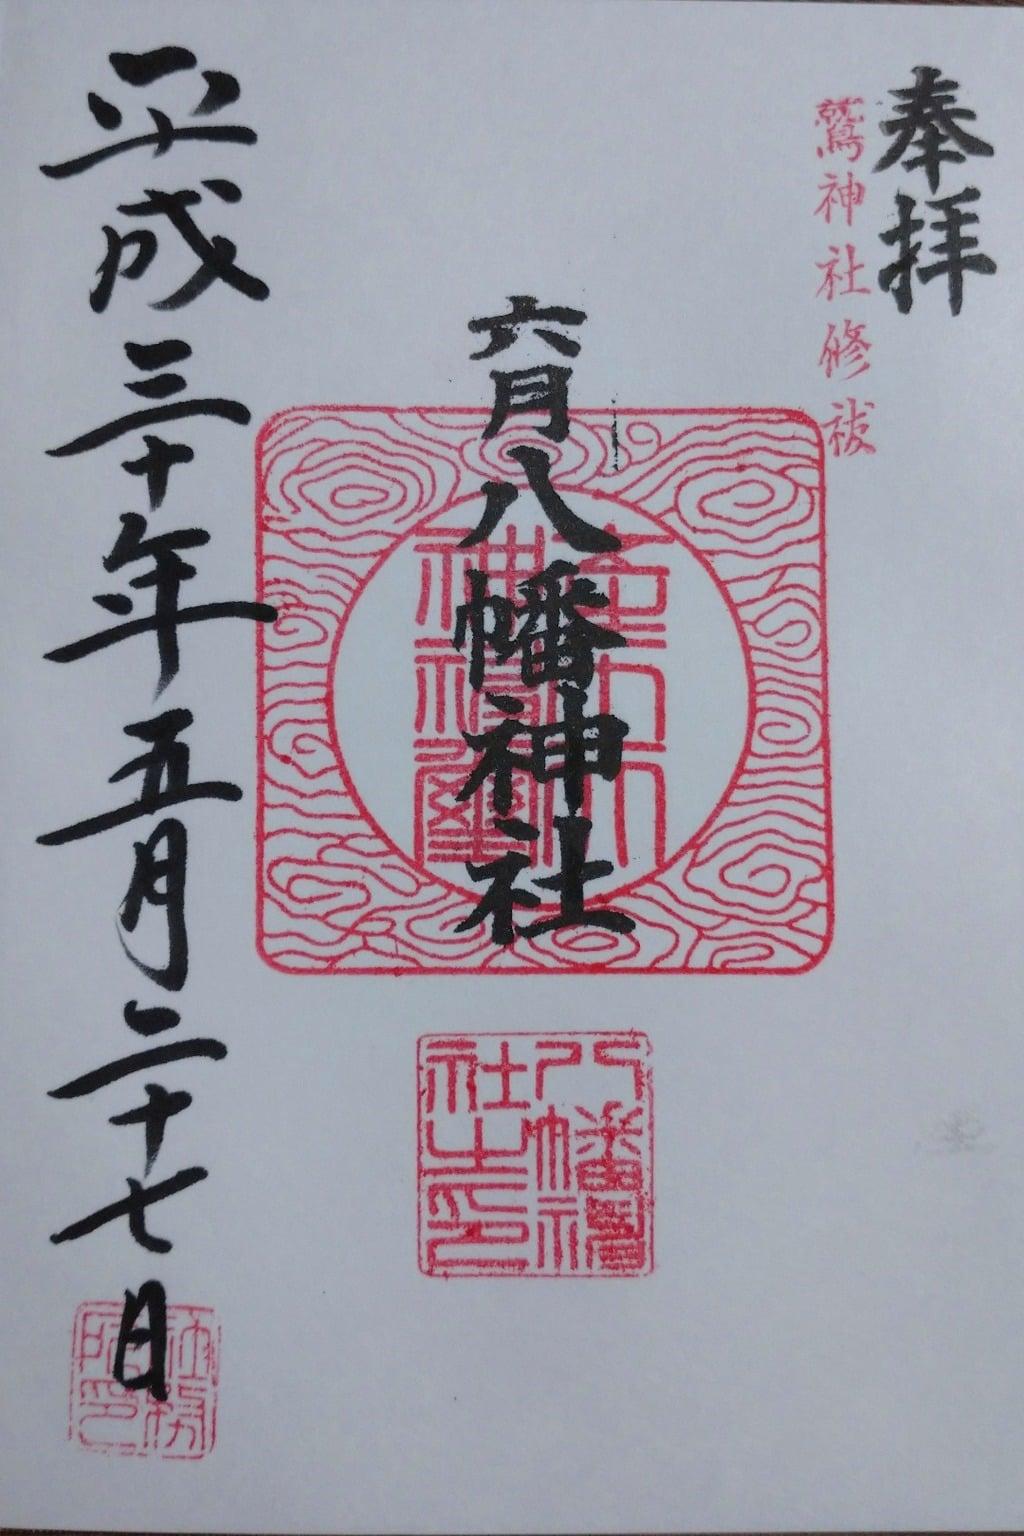 六月八幡神社の御朱印